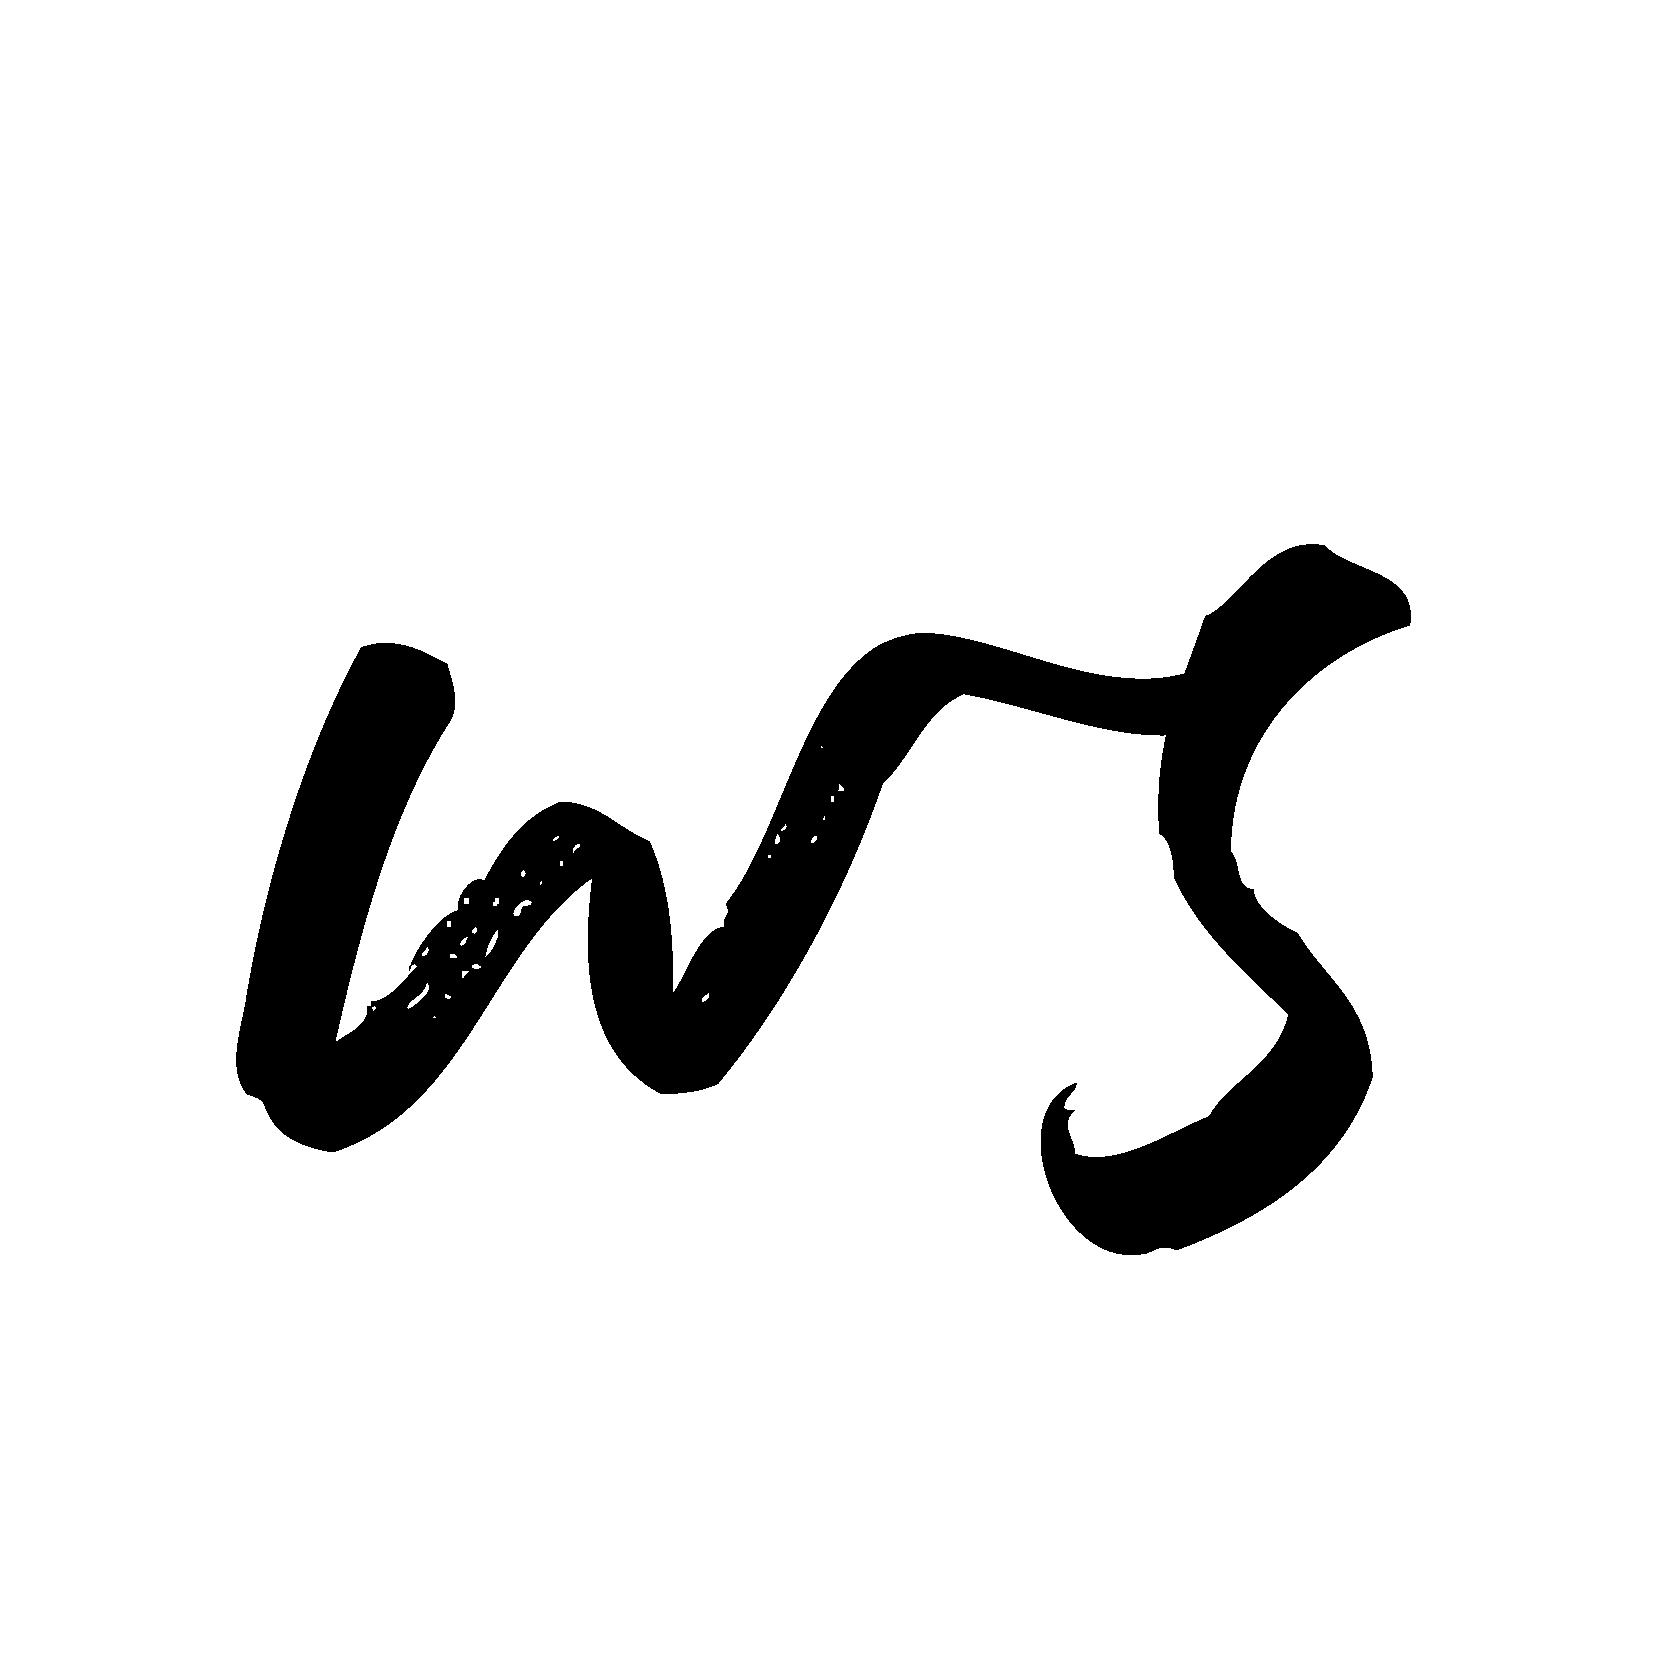 www.well-storied.com